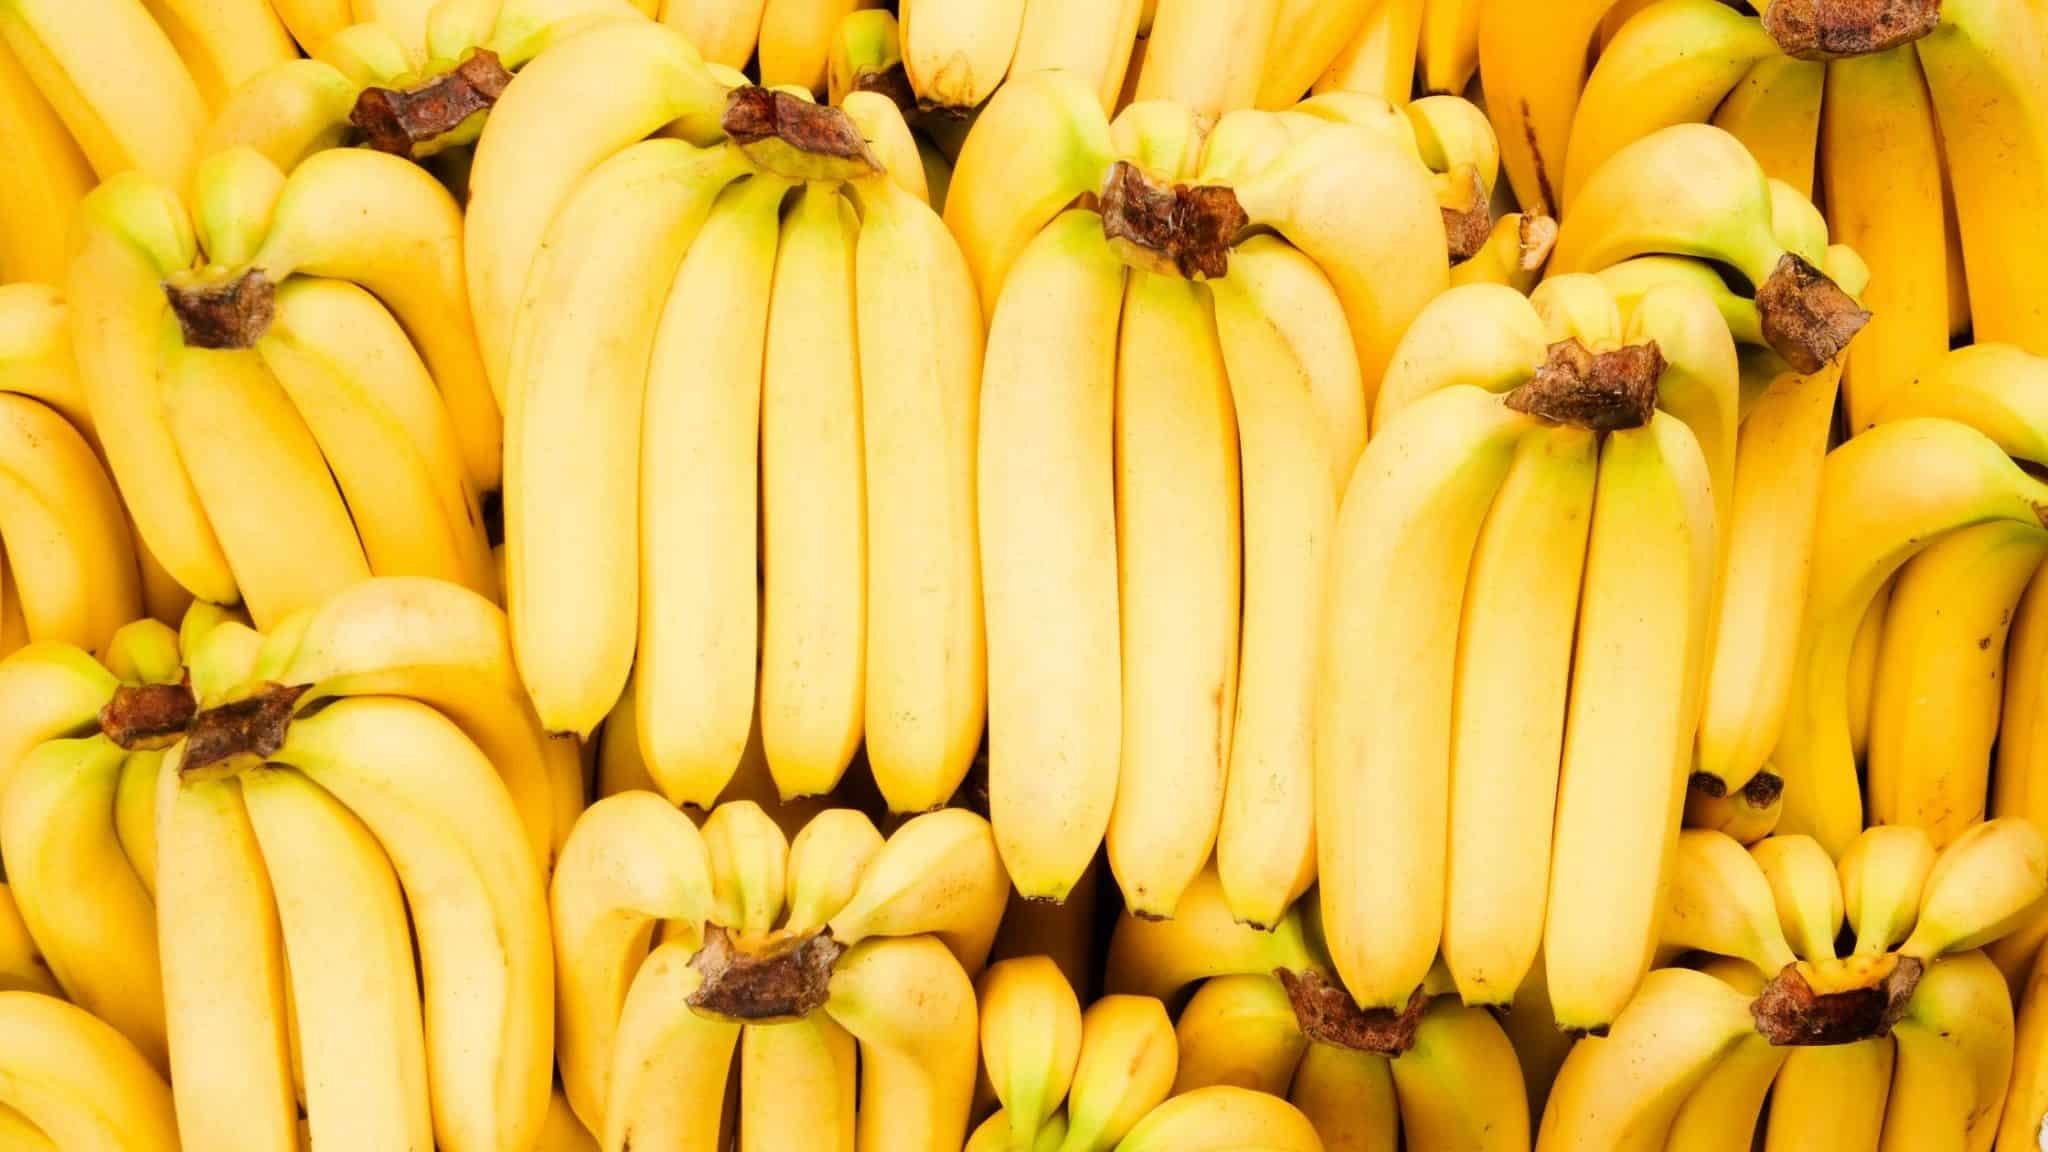 FREE Organic Bananas WYB Cinnamon Toast Crunch